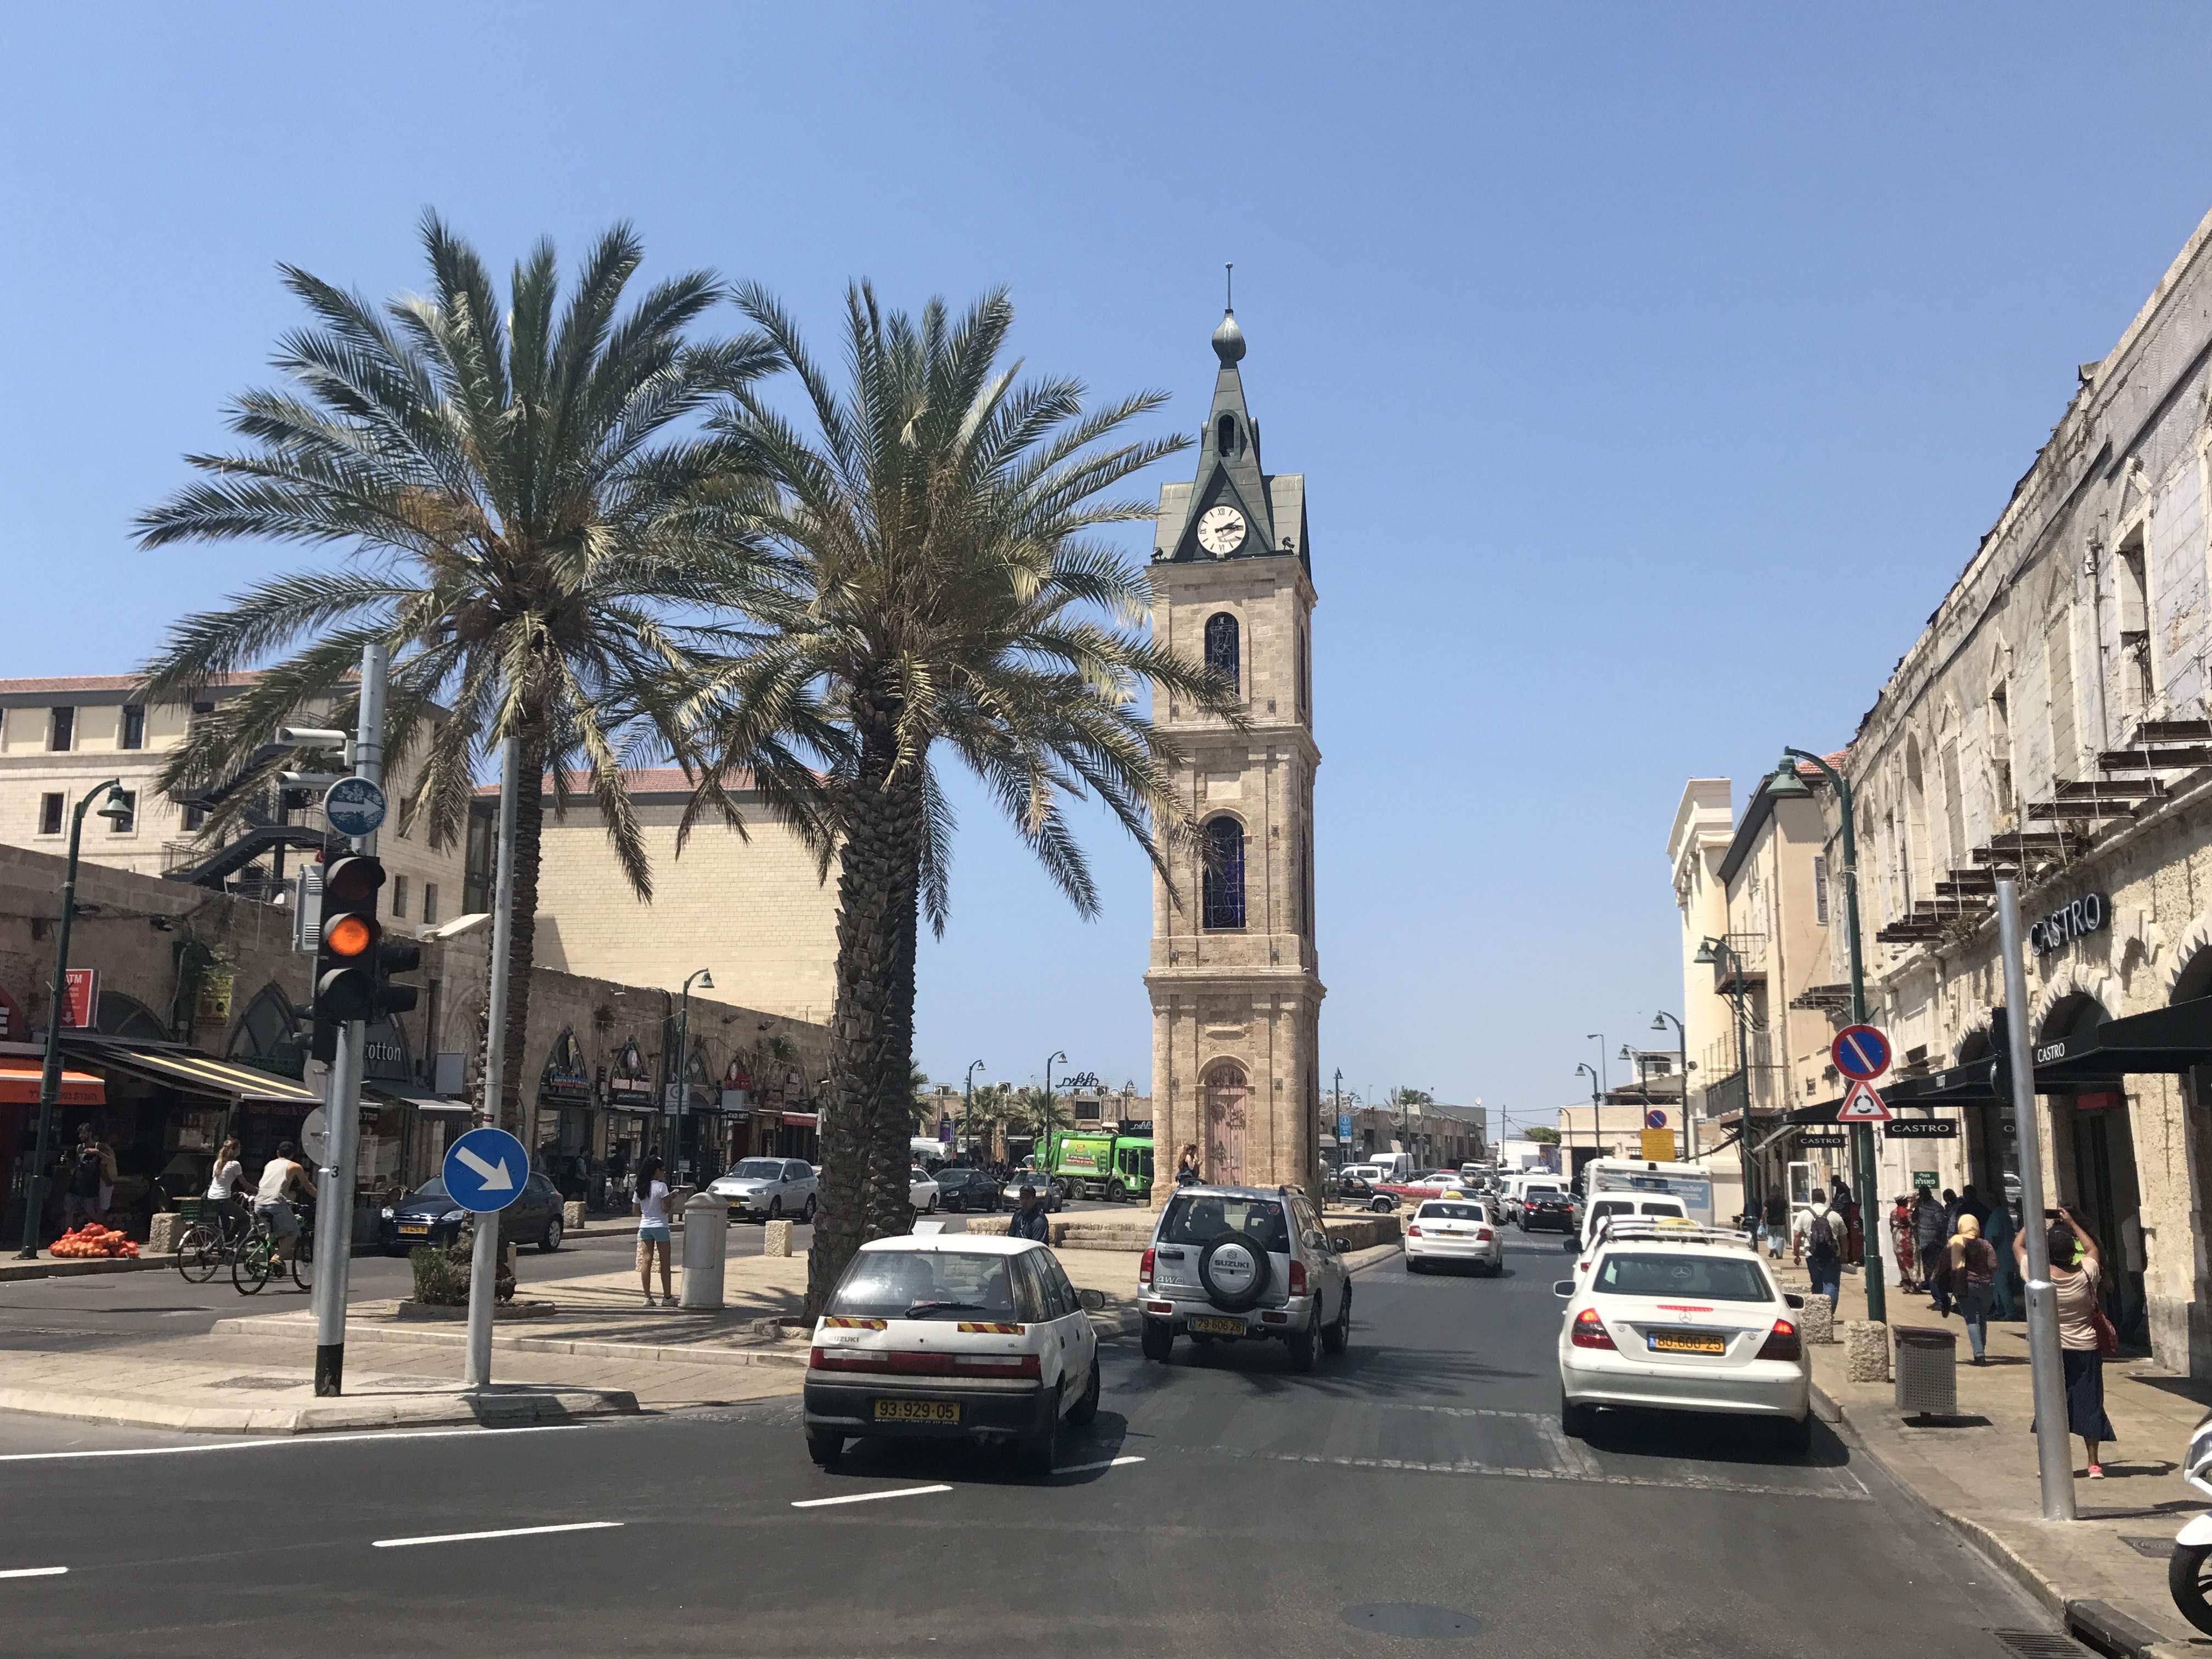 The Jaffa Clock Tower